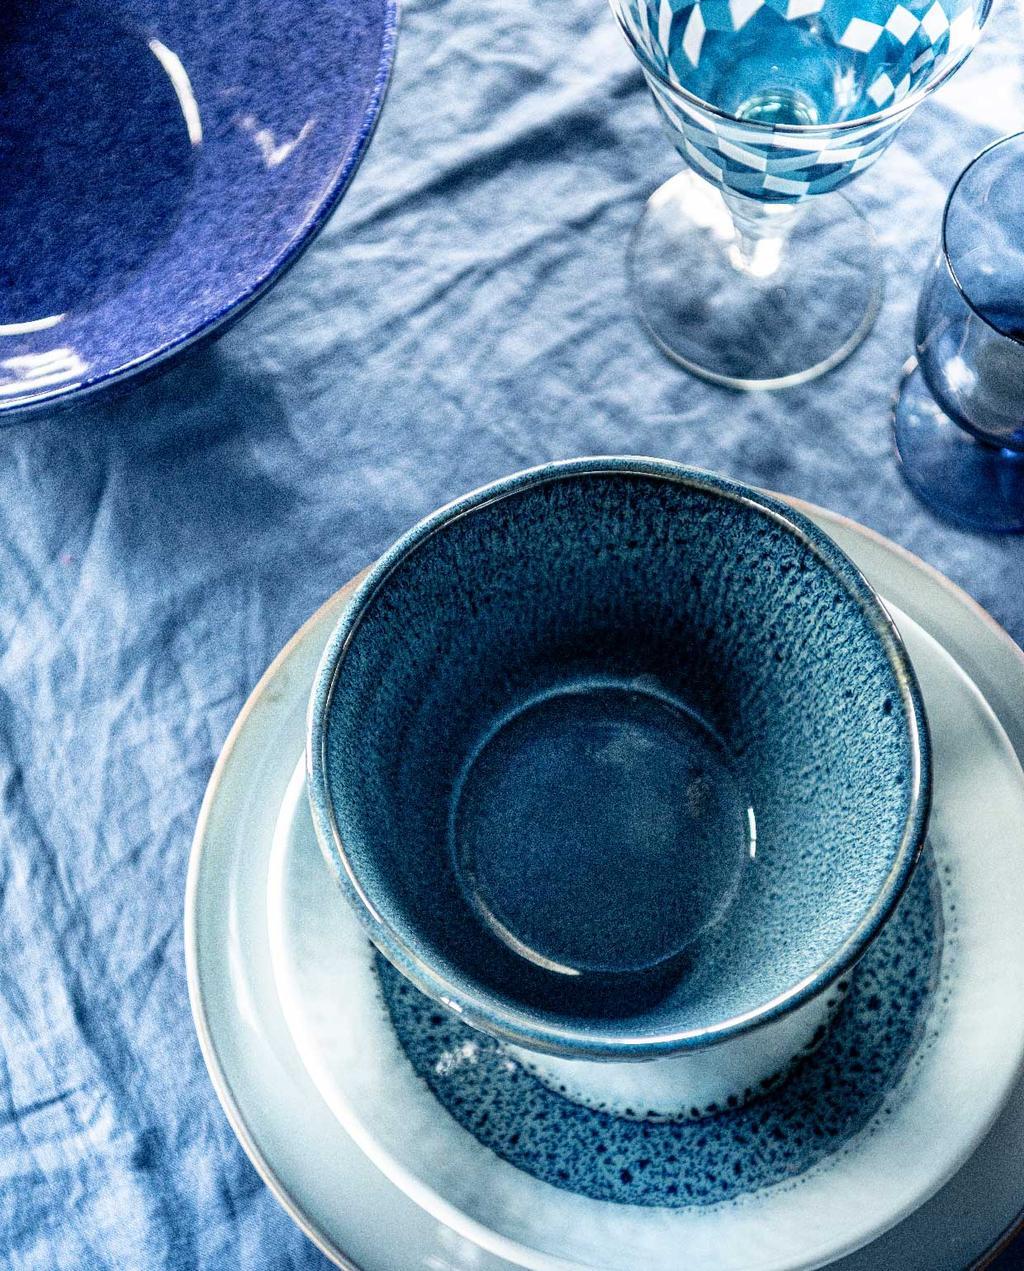 vtwonen 07-2020 | styling blauw eilandhoppen blauw servies op blauw linnen tafelkleed